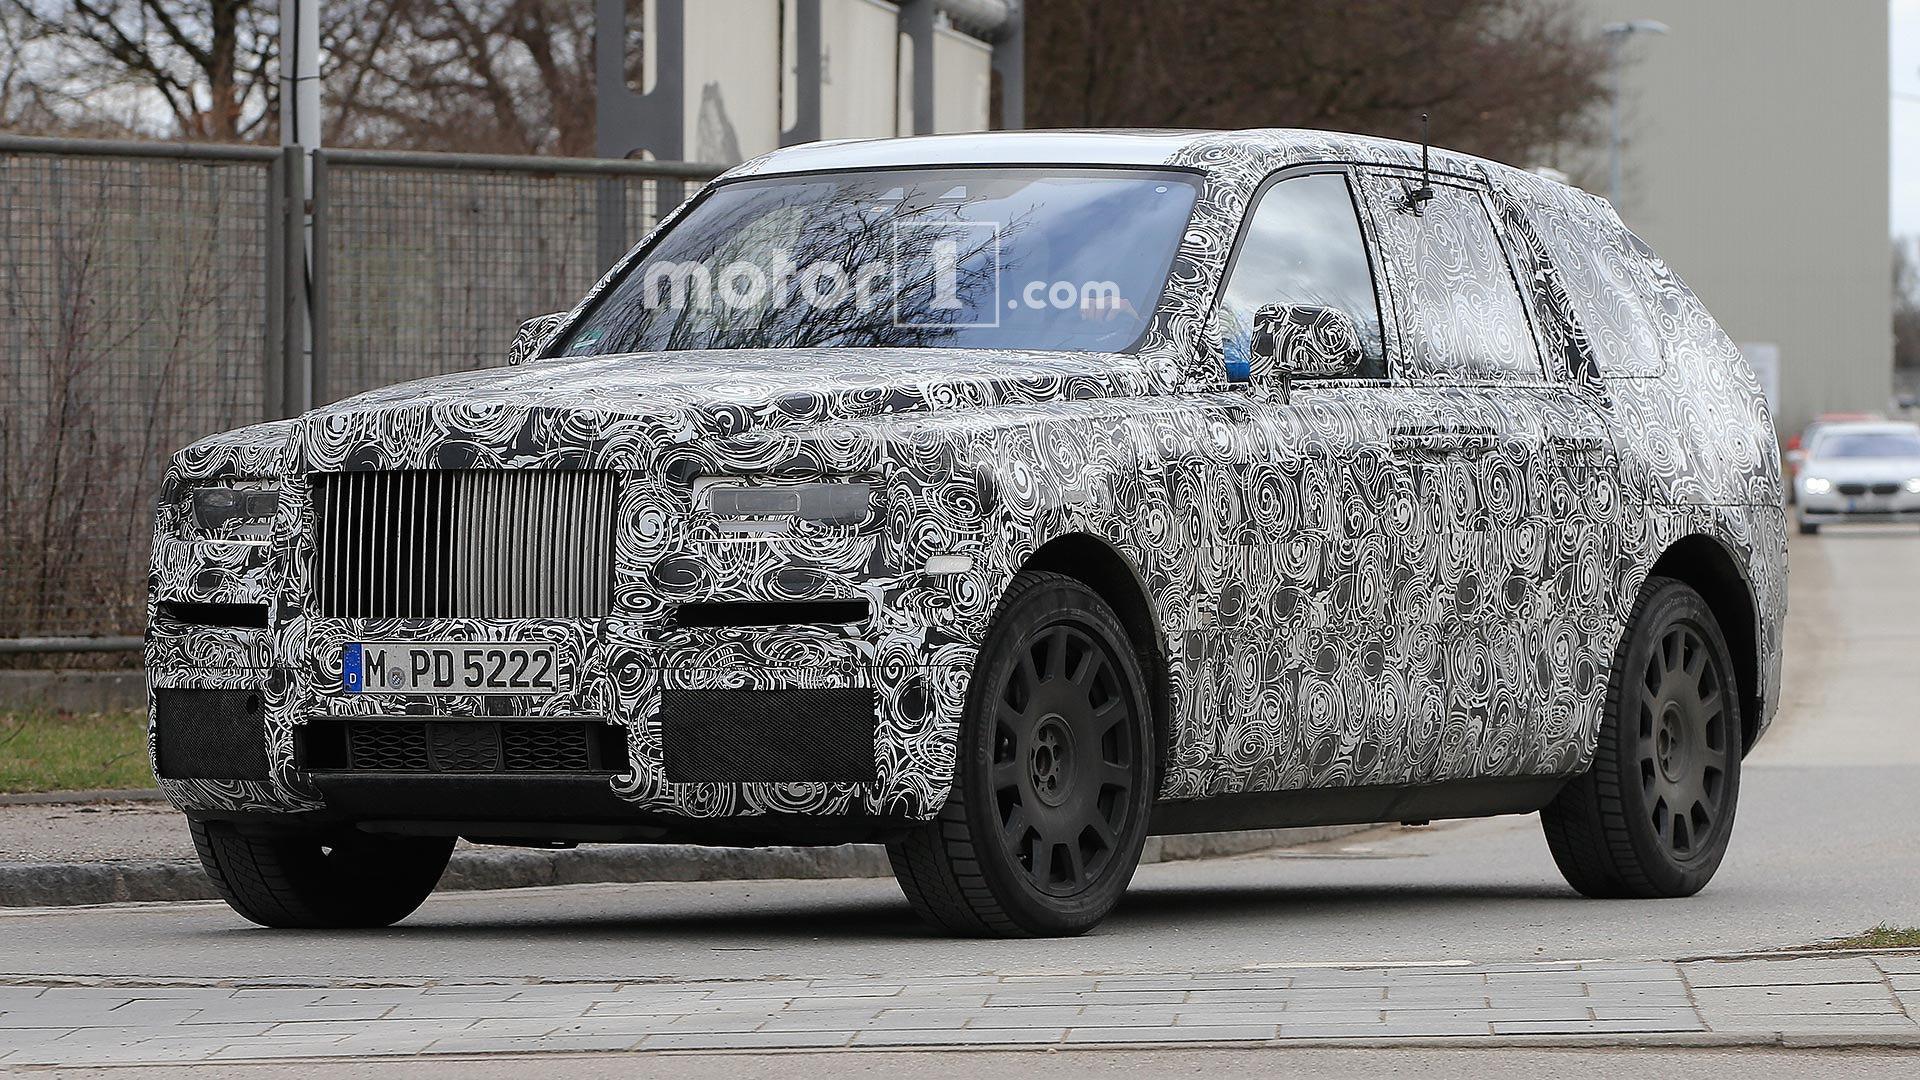 Rolls Royce Cullinan Suv Caught Testing In Europe